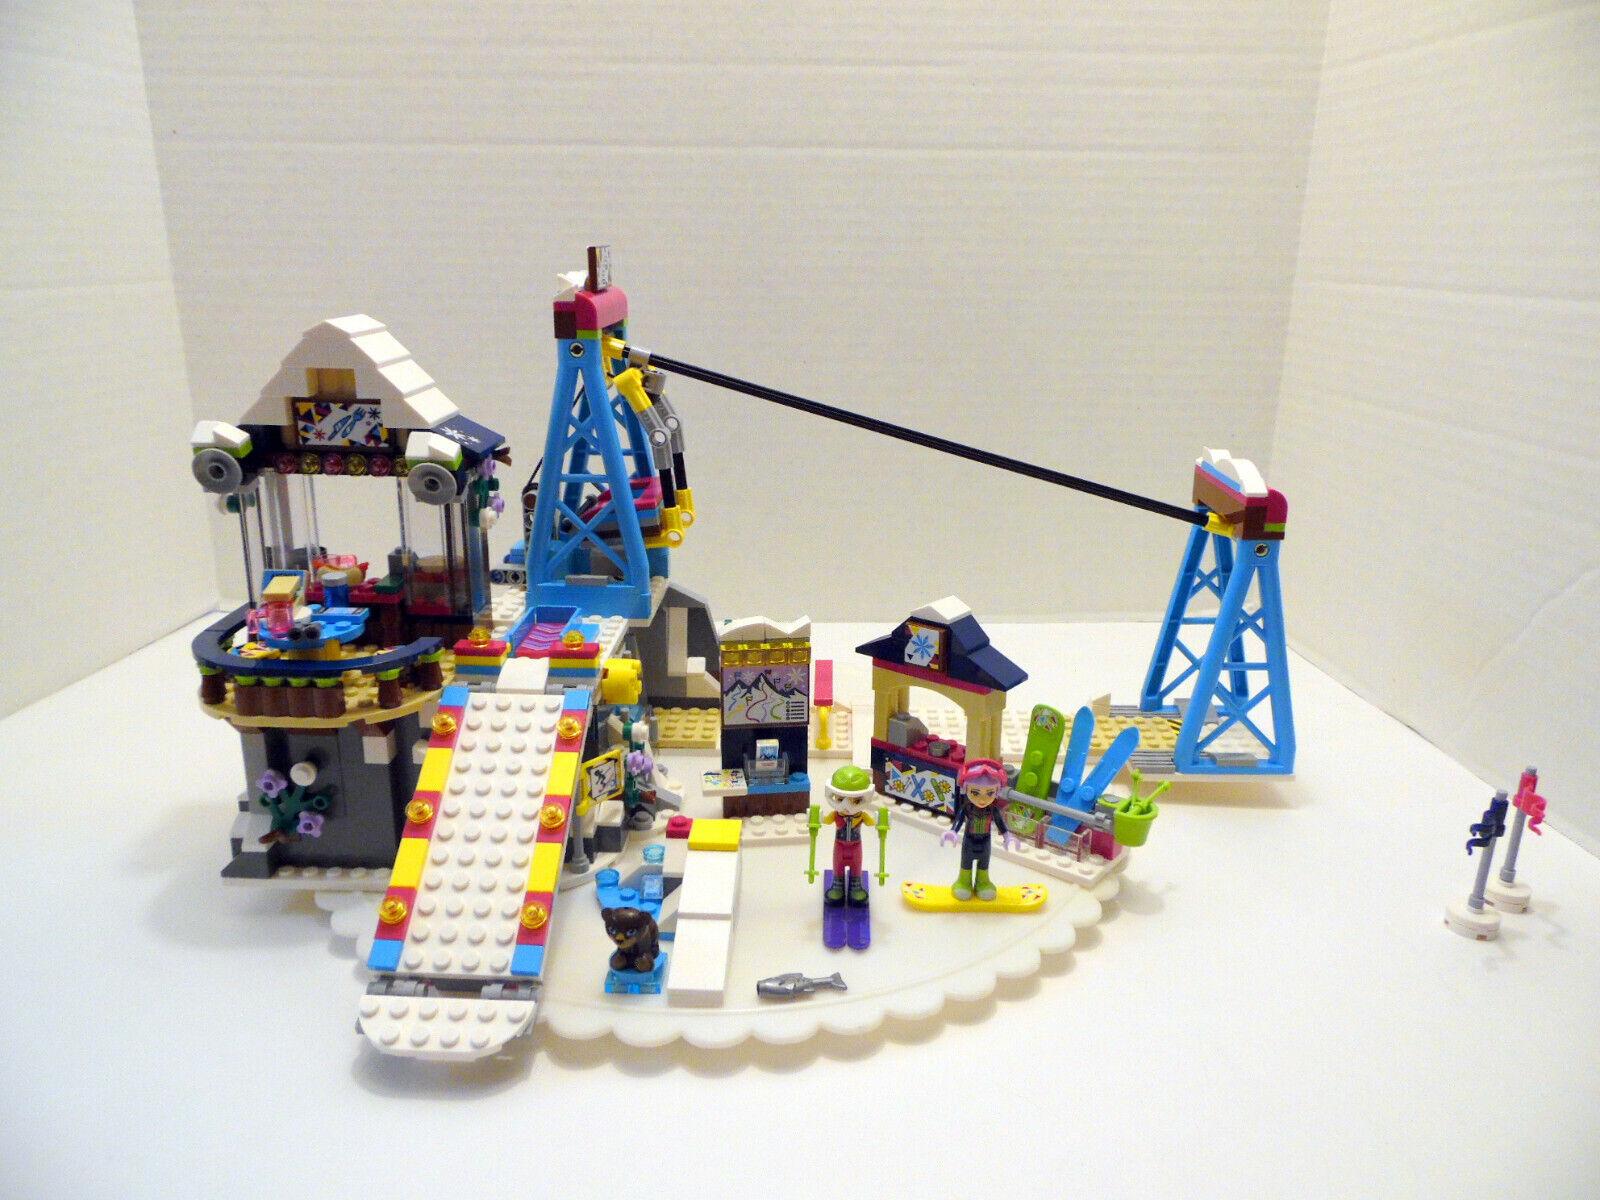 41324 Lego Complete Build 100% 2017 Lift Ski Resort Snow